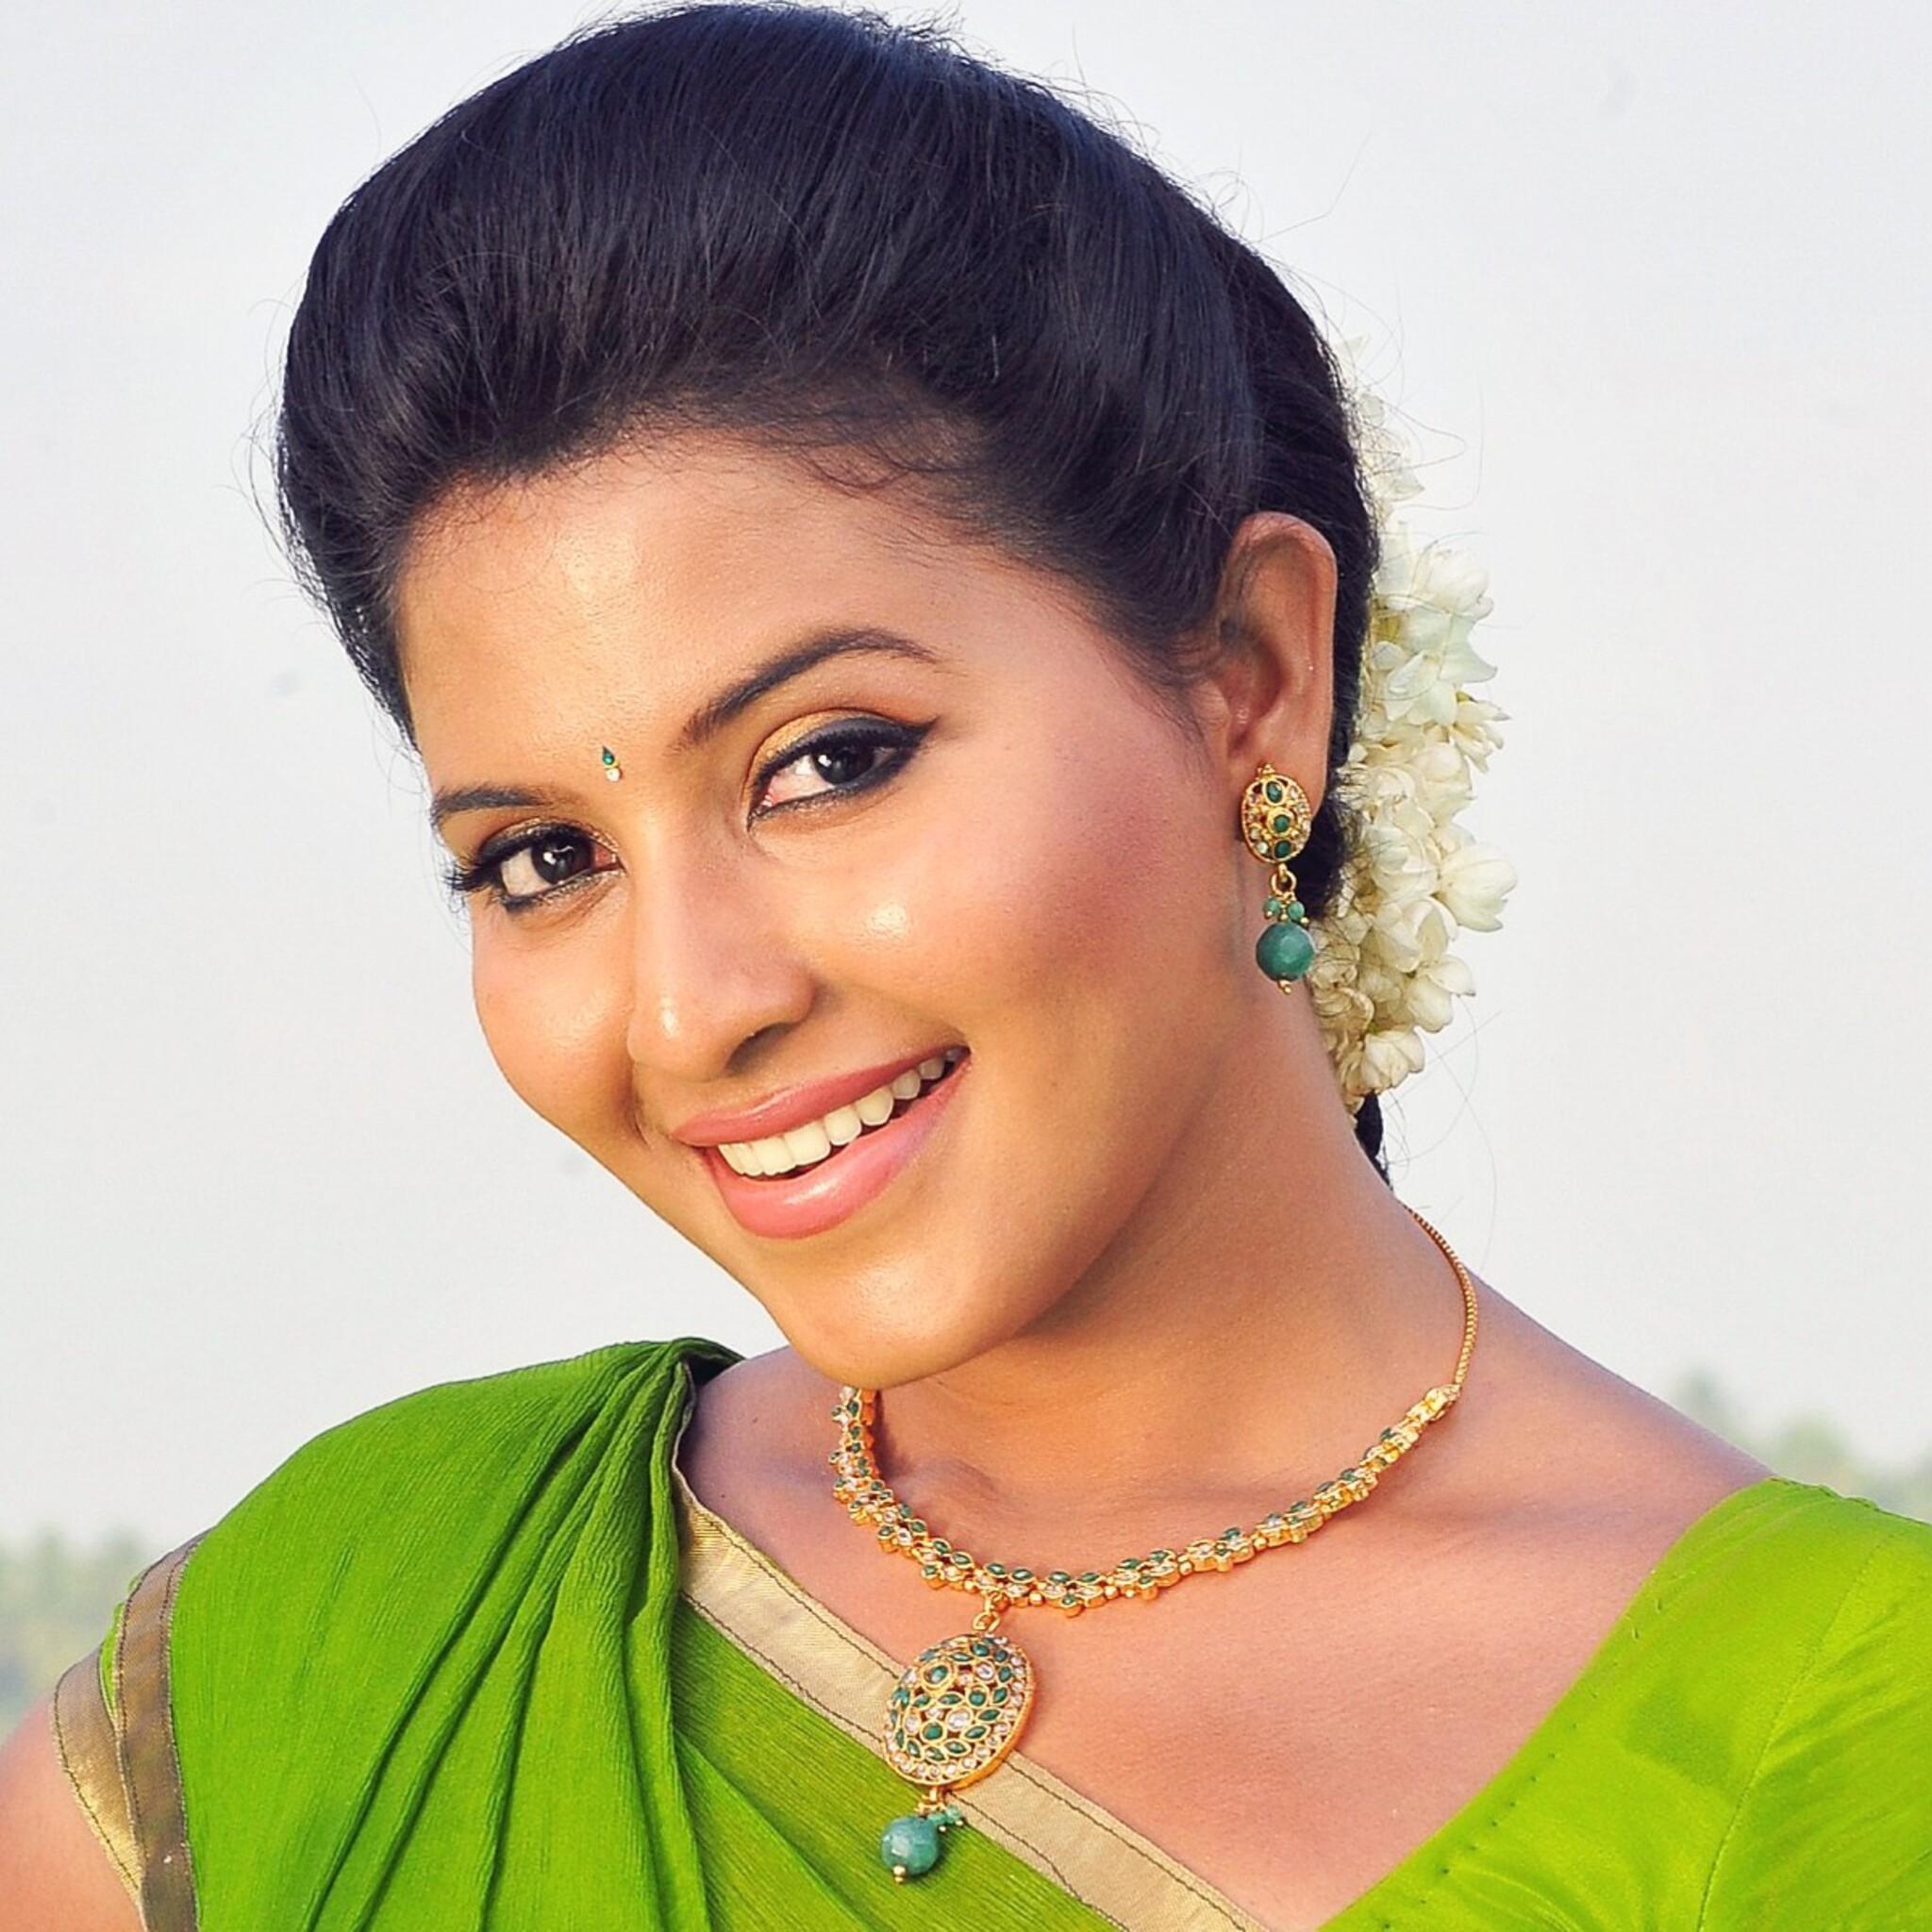 2048x2048 anjali telugu actress ipad air hd 4k wallpapers images backgrounds photos and pictures - Telugu hd wallpaper ...